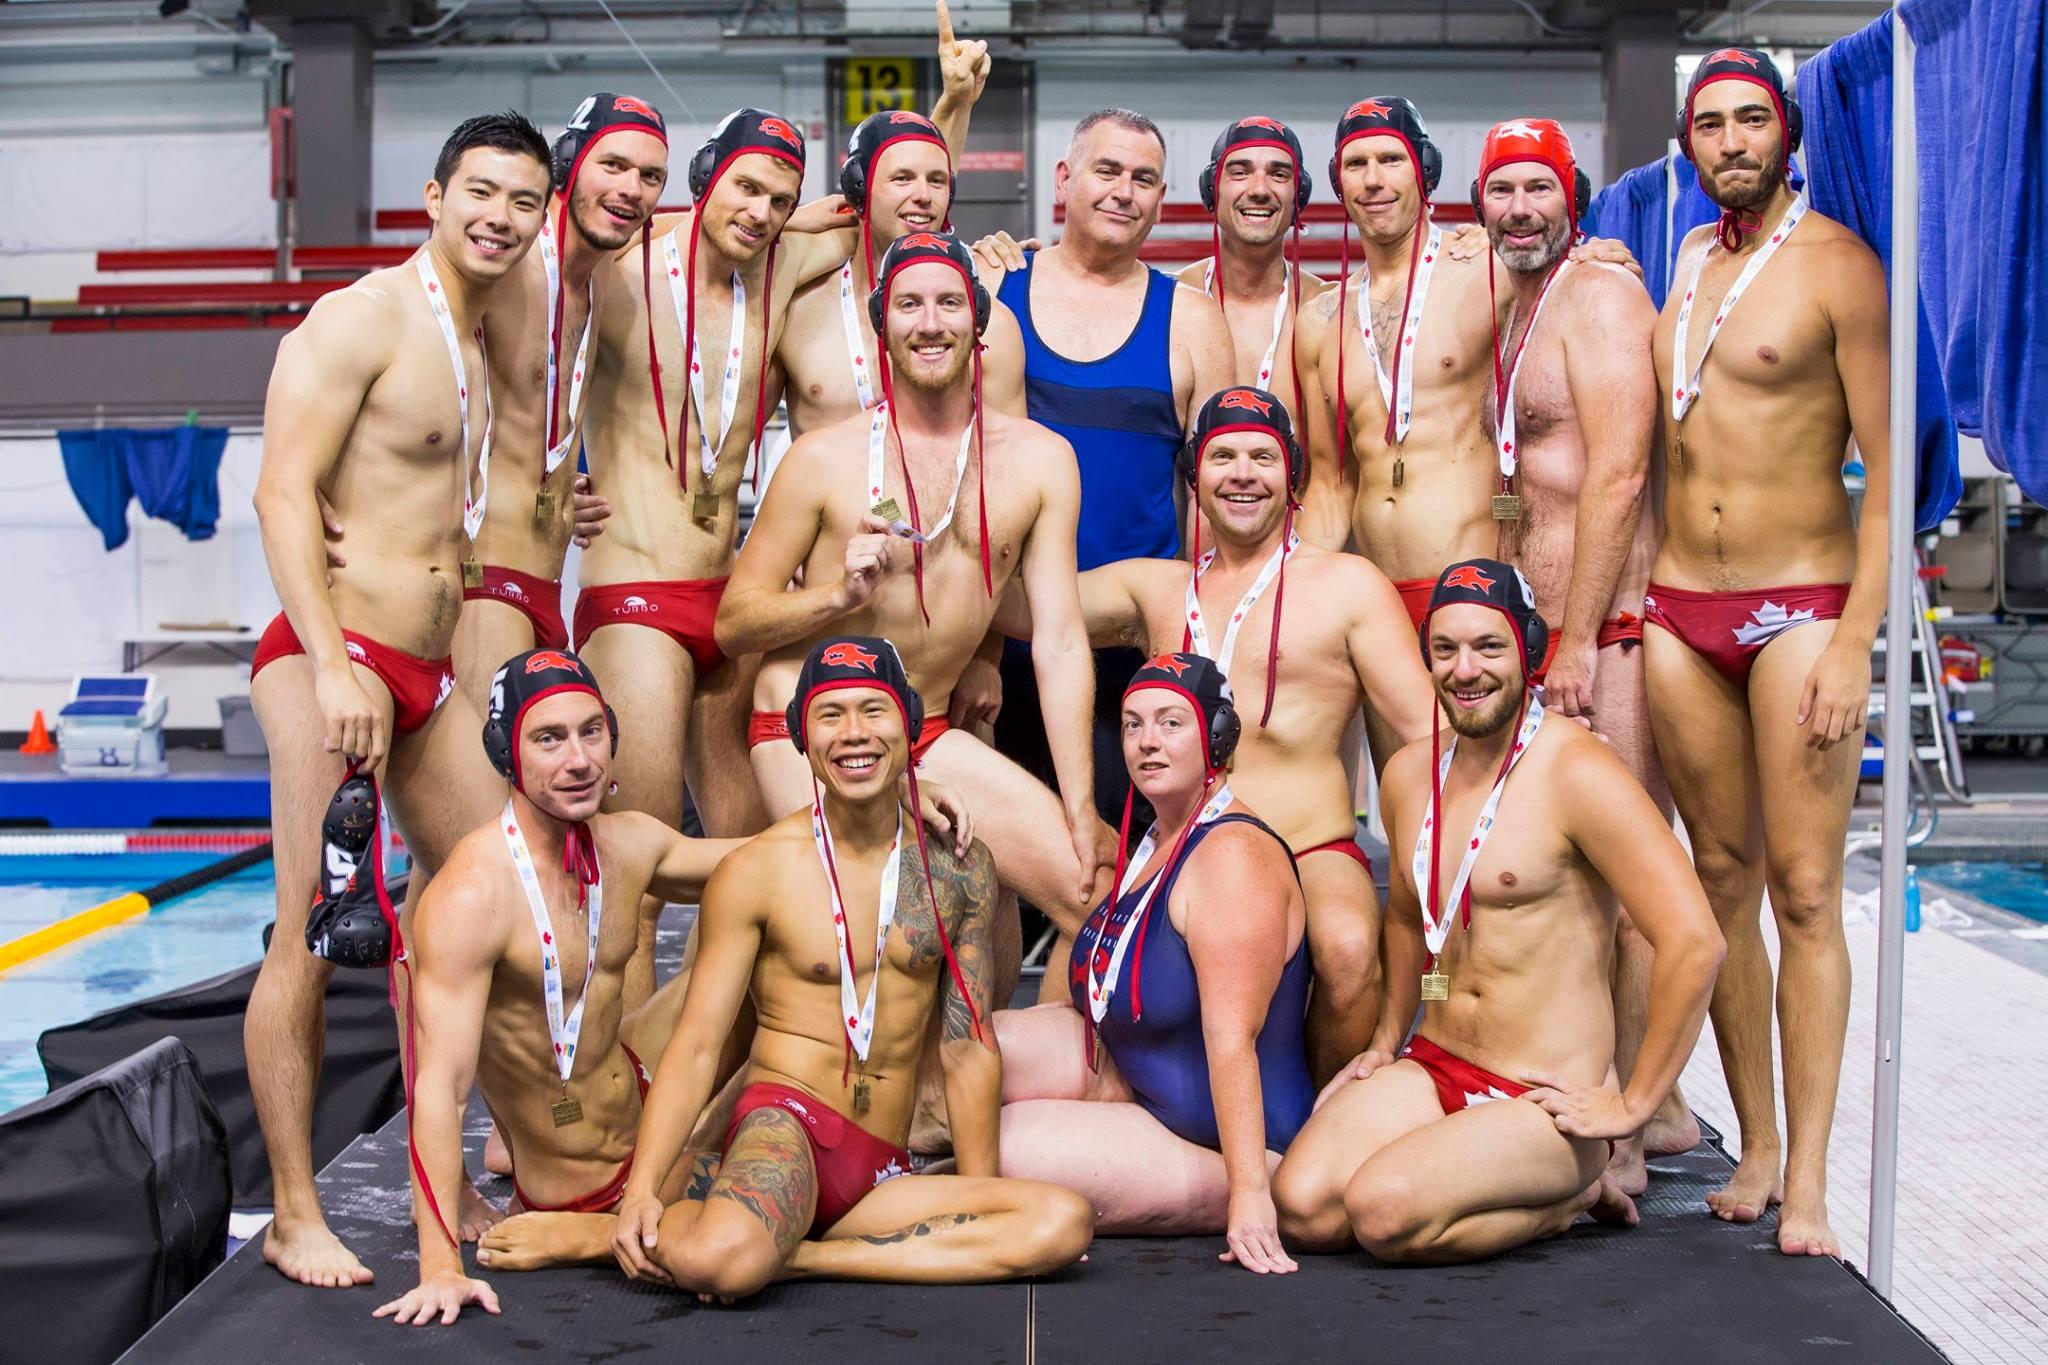 IGLA 2016 (Edmonton) - Recreational Division - Gold